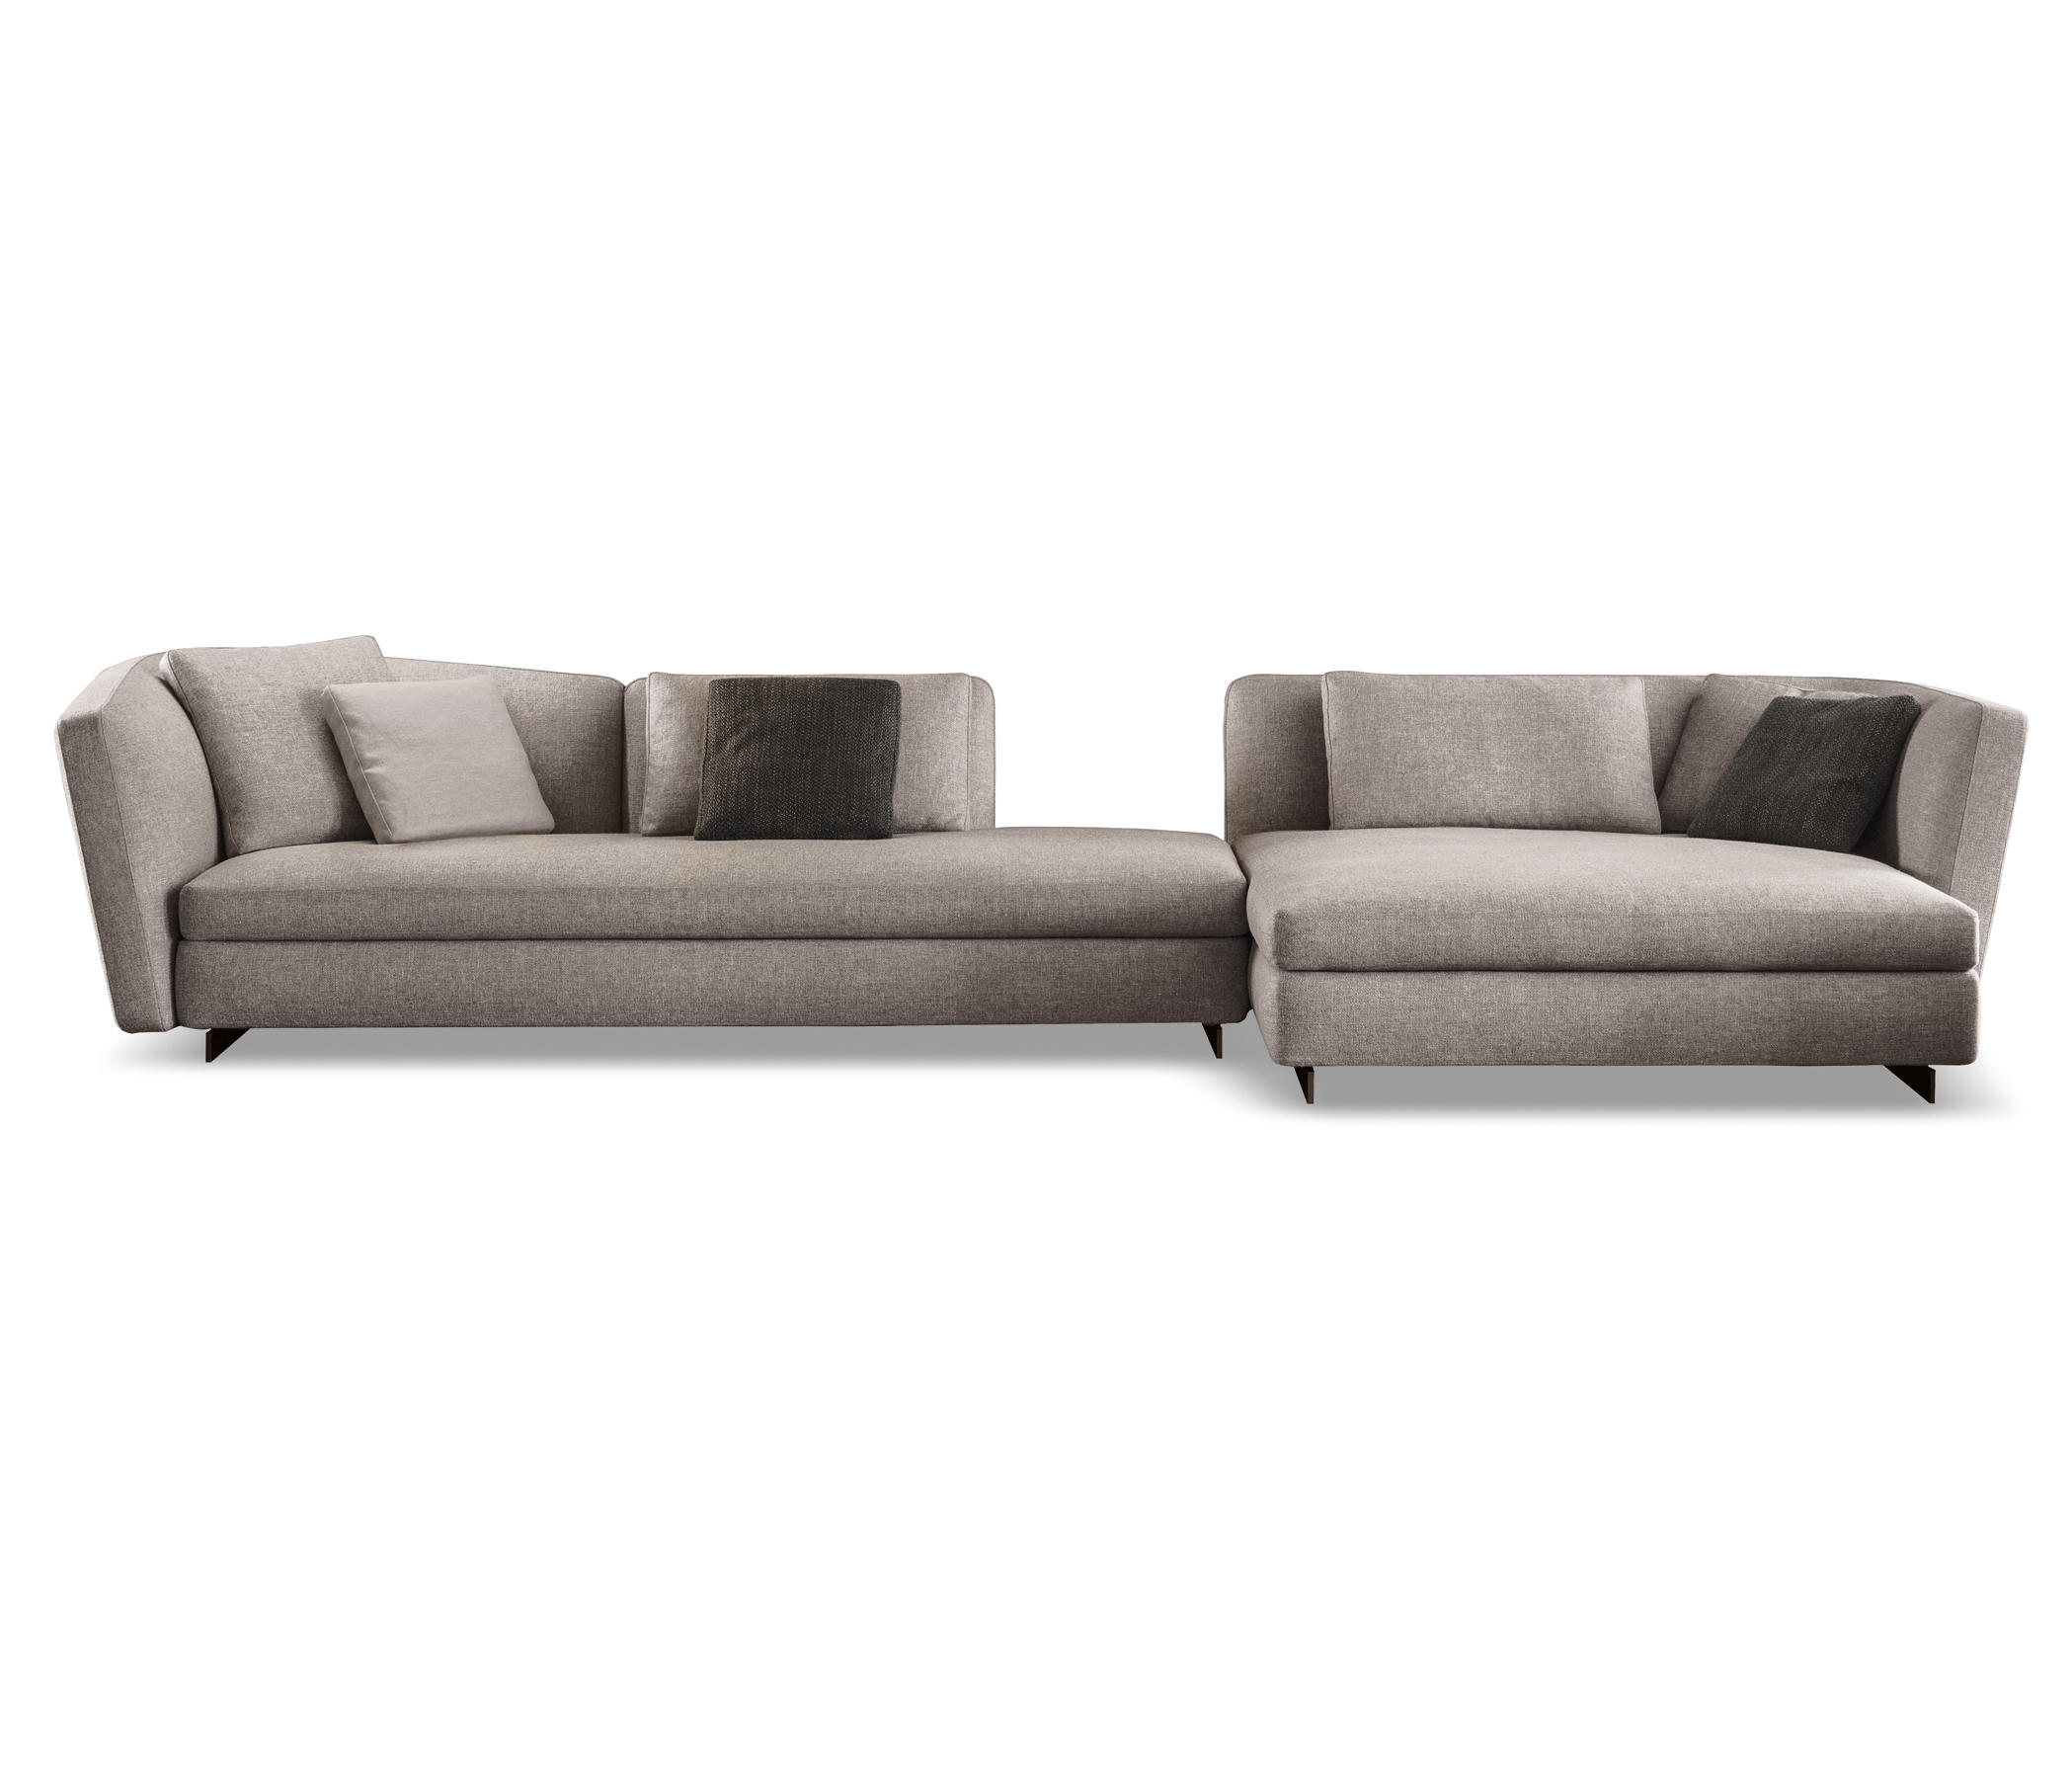 SEYMOUR - Modular Sofa Systems From Minotti